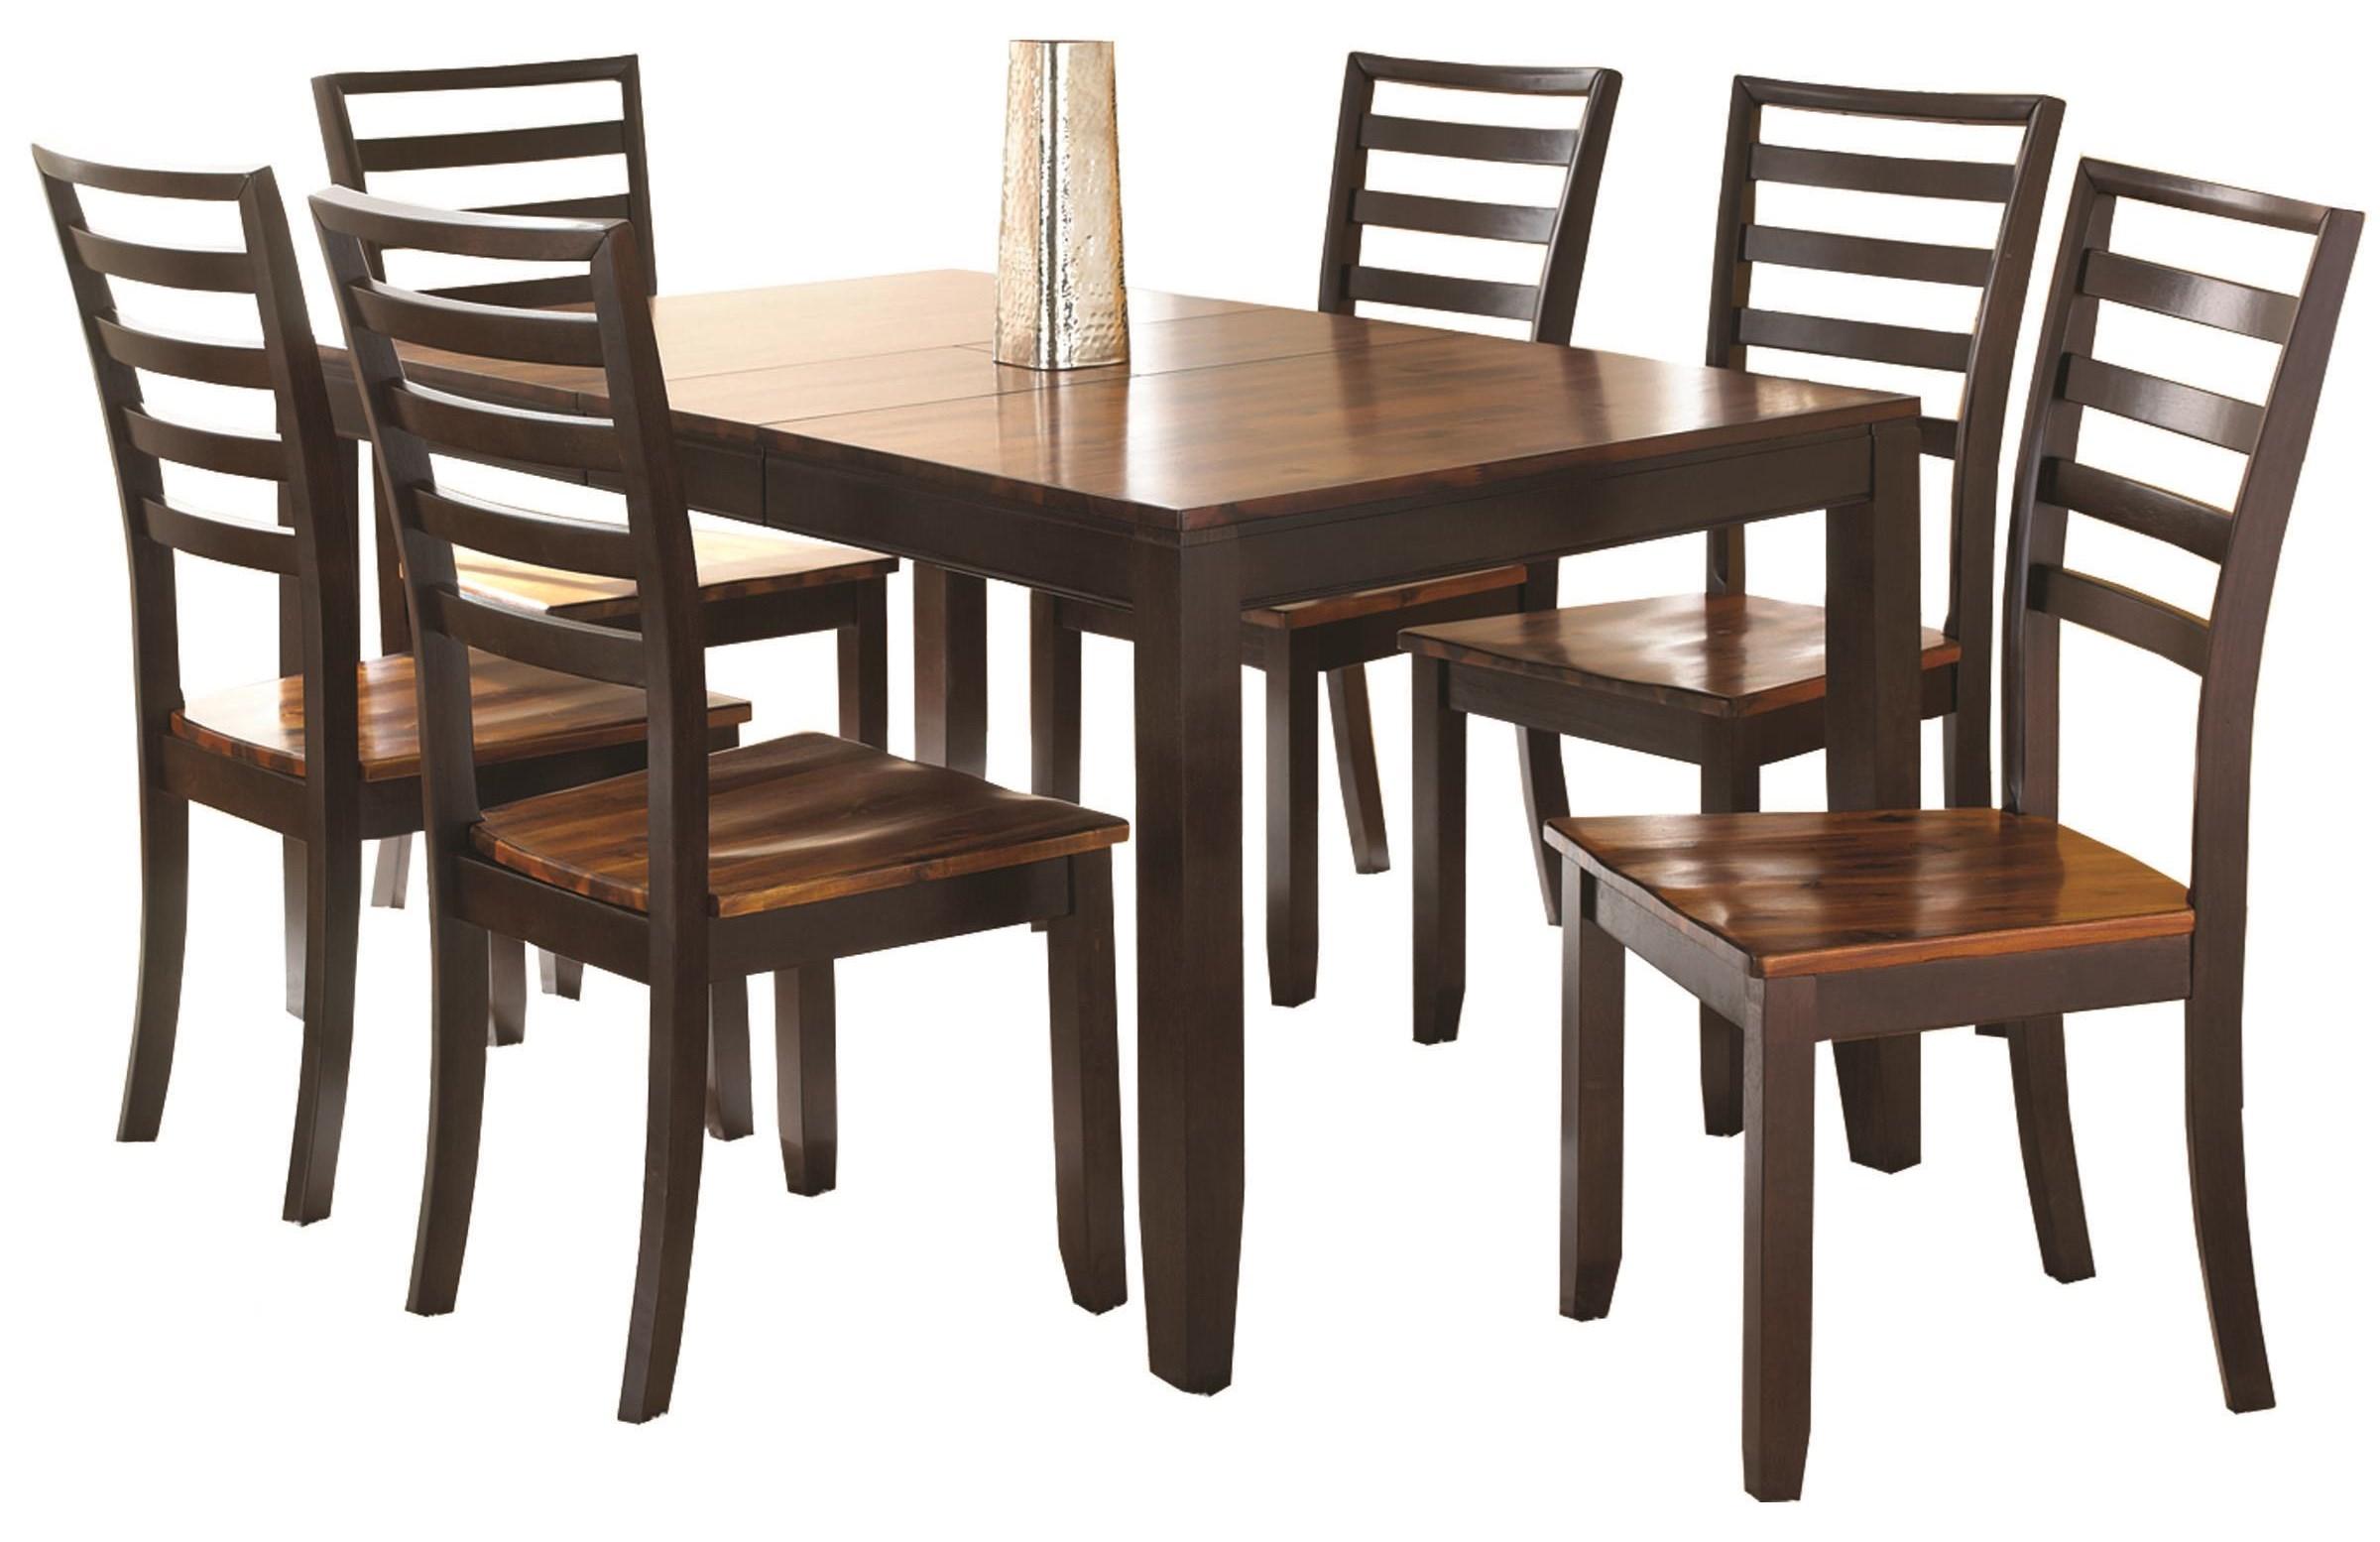 7-Piece Dining Set at Sadler's Home Furnishings